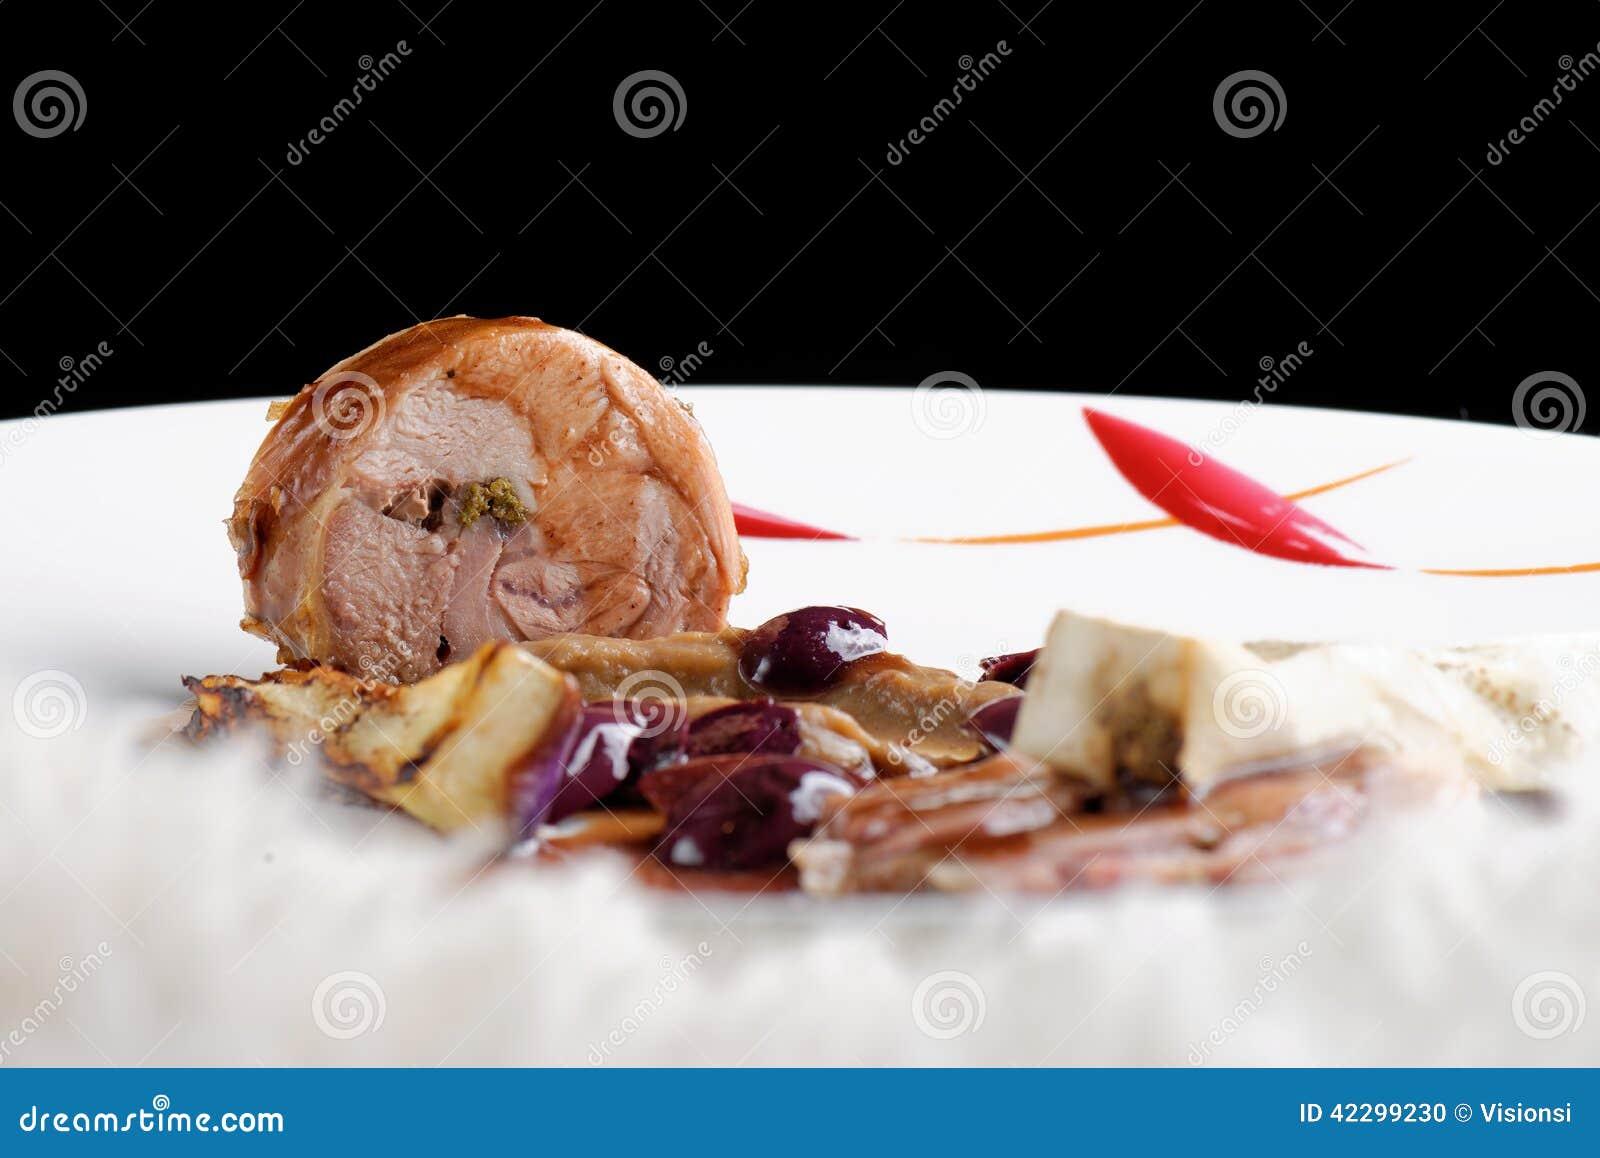 fine dining gourmet main entree course grilled lamb steak olives aubergines 42299230 17 Beau Table Cuisine Carree Kdj5